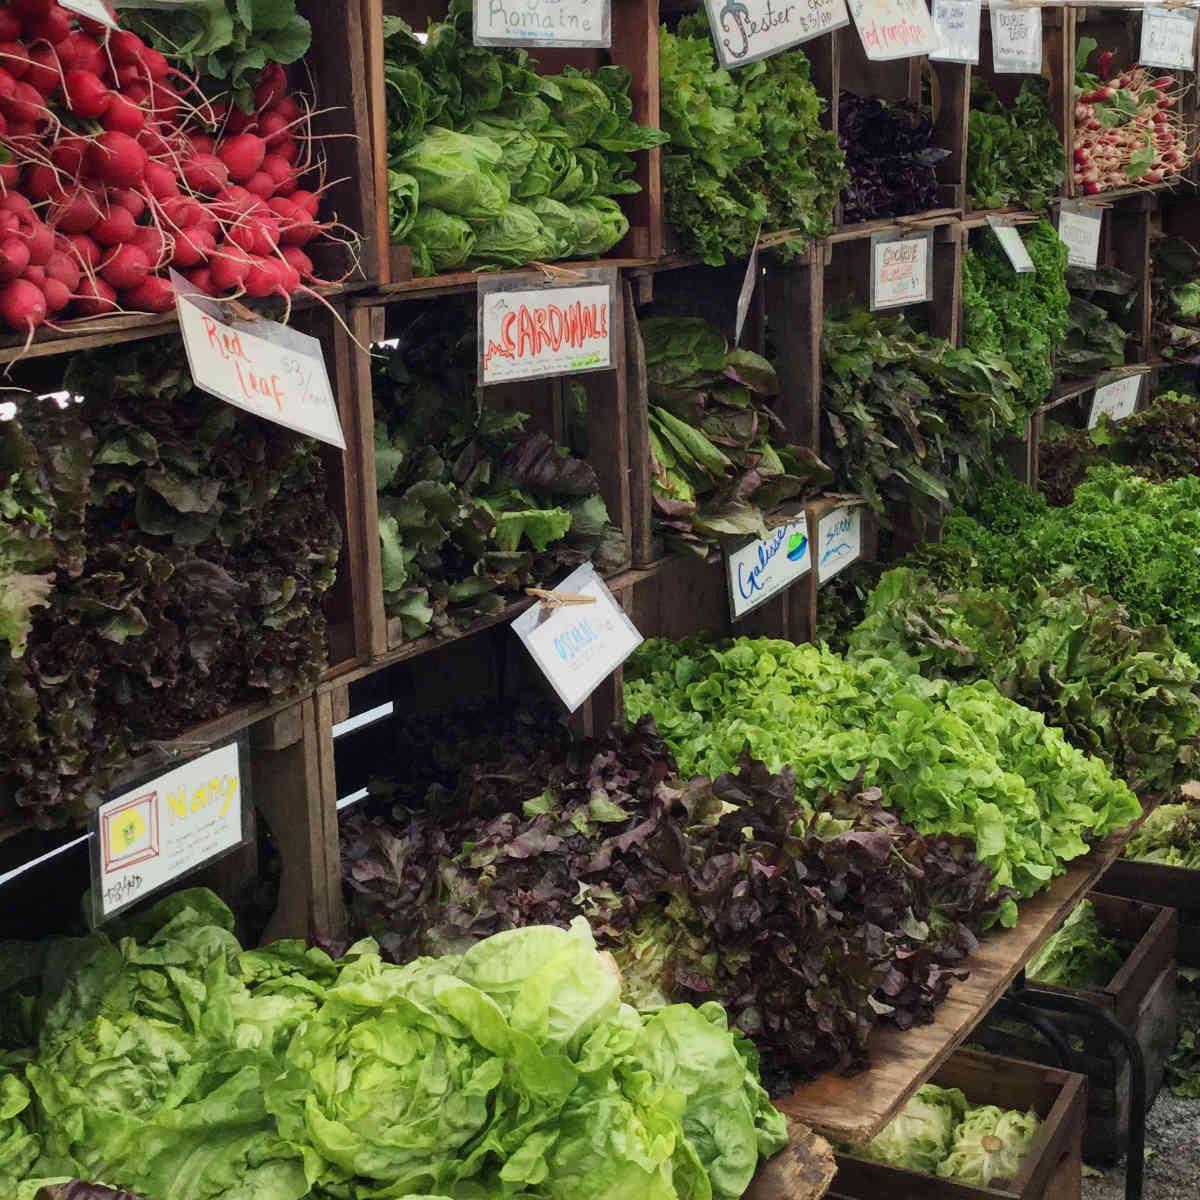 Evanston Market lettuces